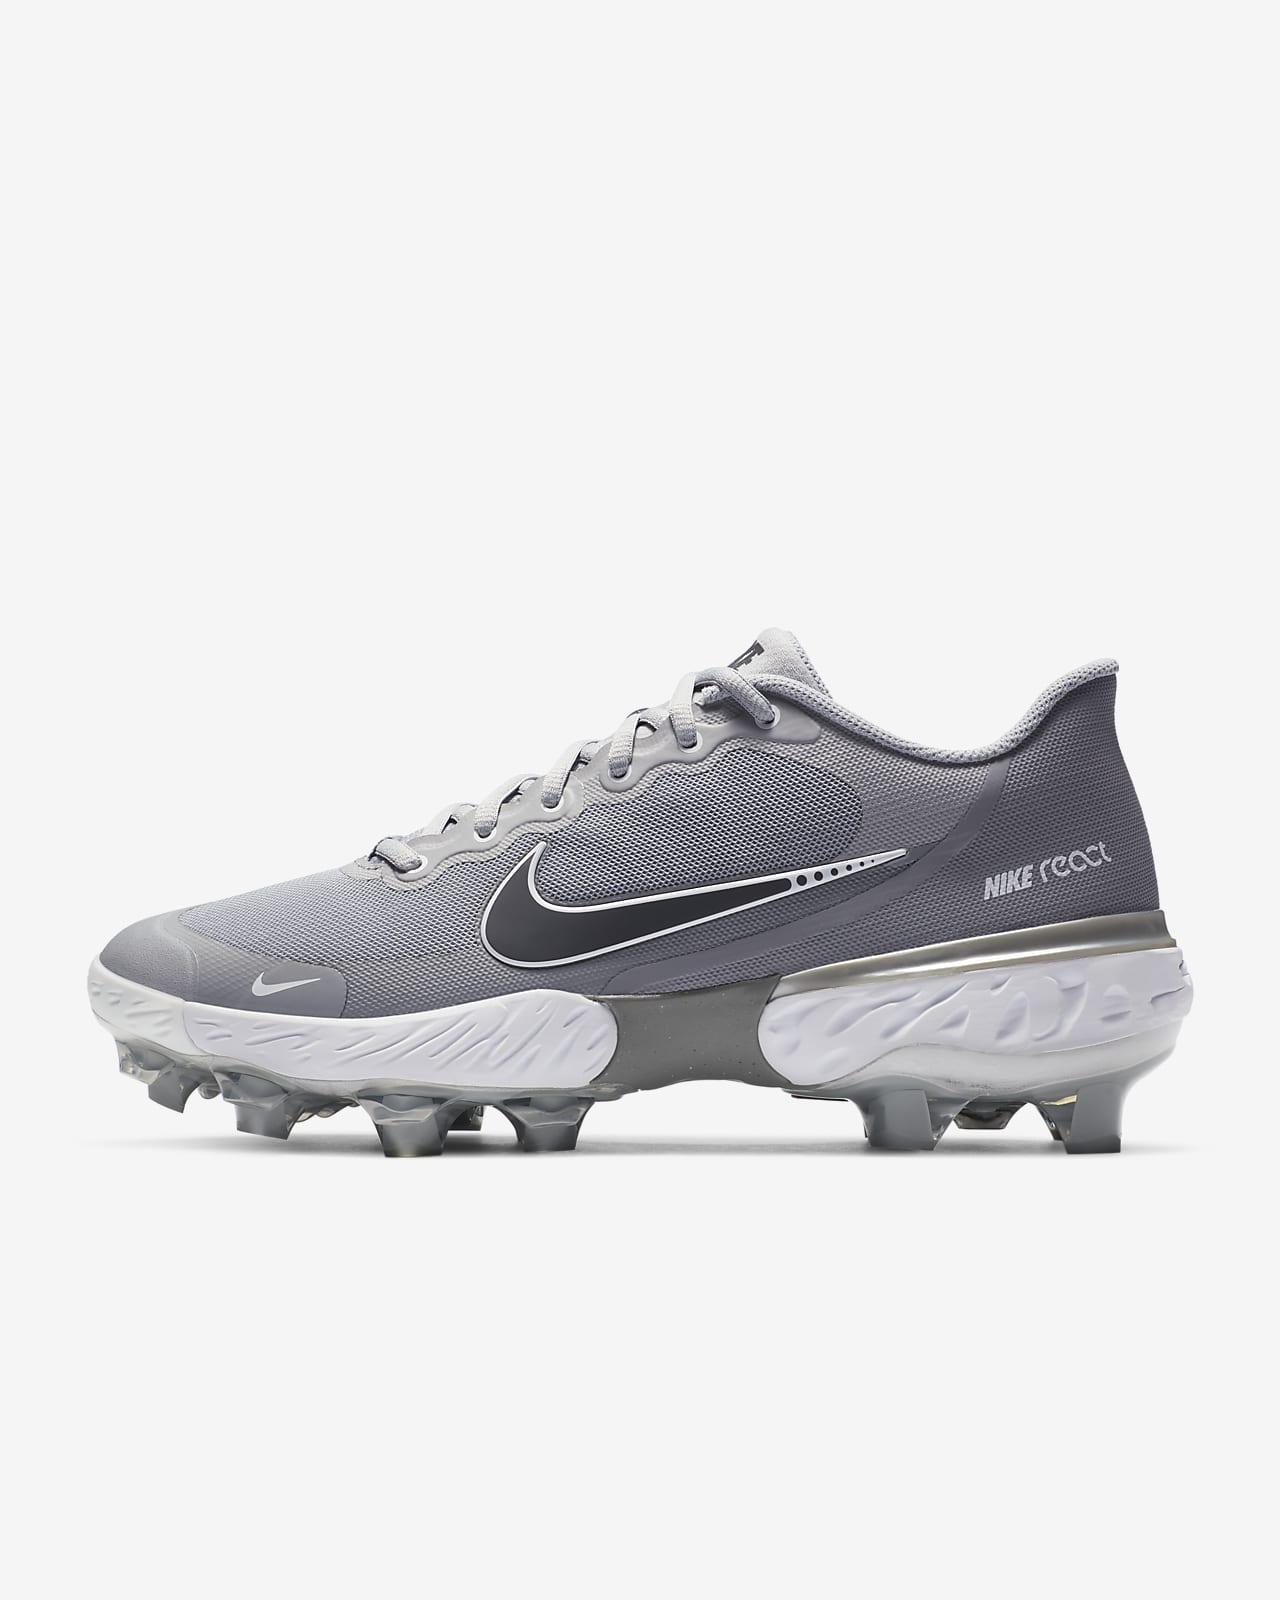 Nike Alpha Huarache Elite 3 Low MCS Baseball Cleat